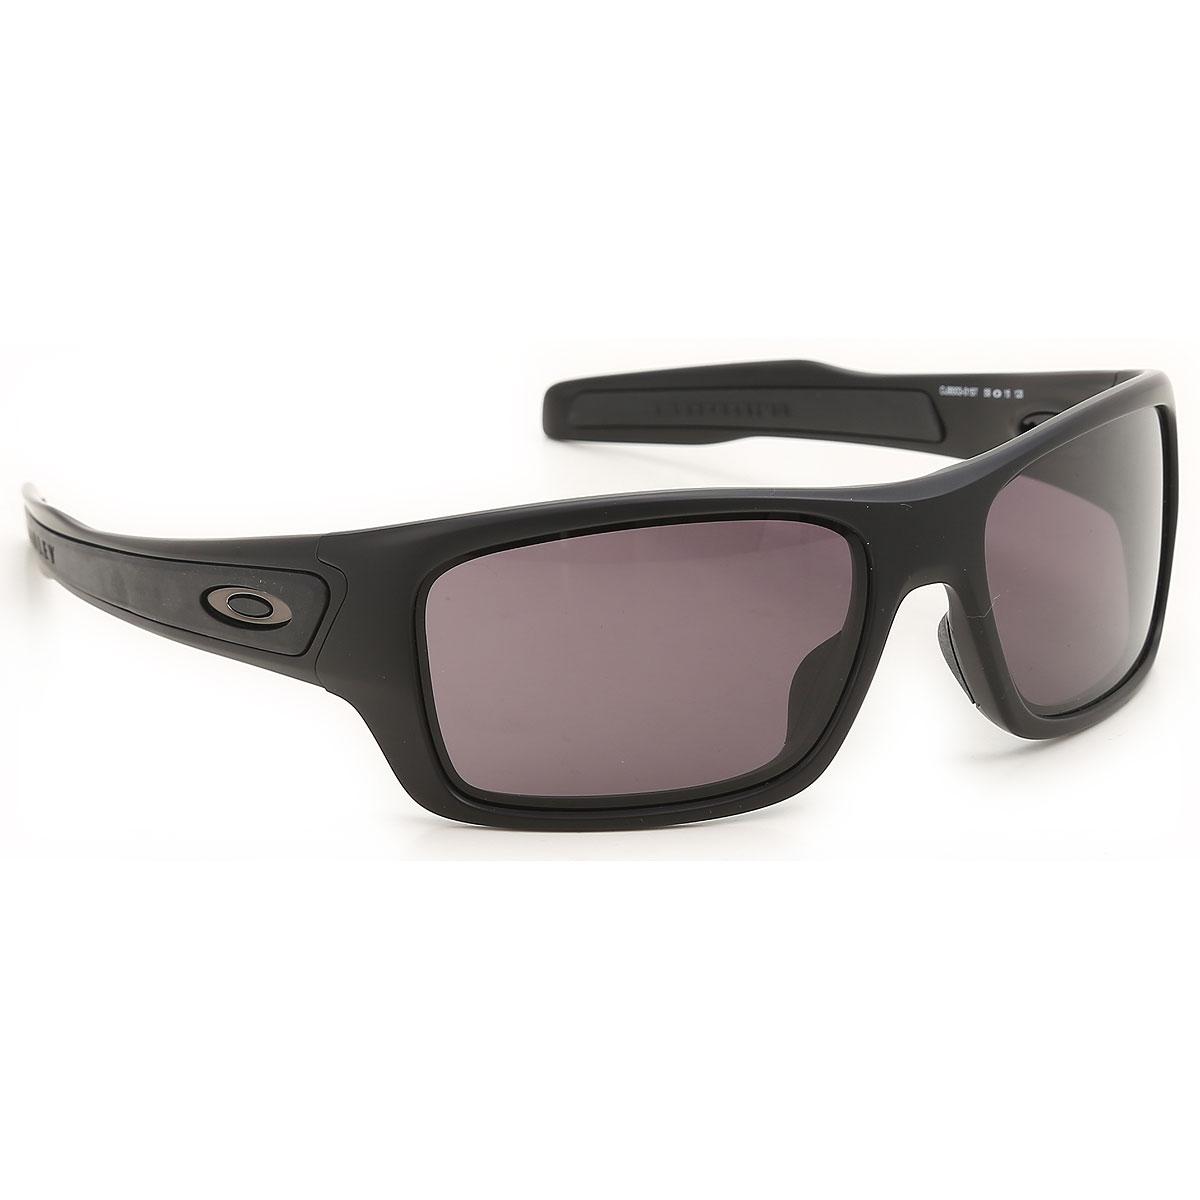 Oakley Kids Sunglasses for Boys On Sale, Black, 2019